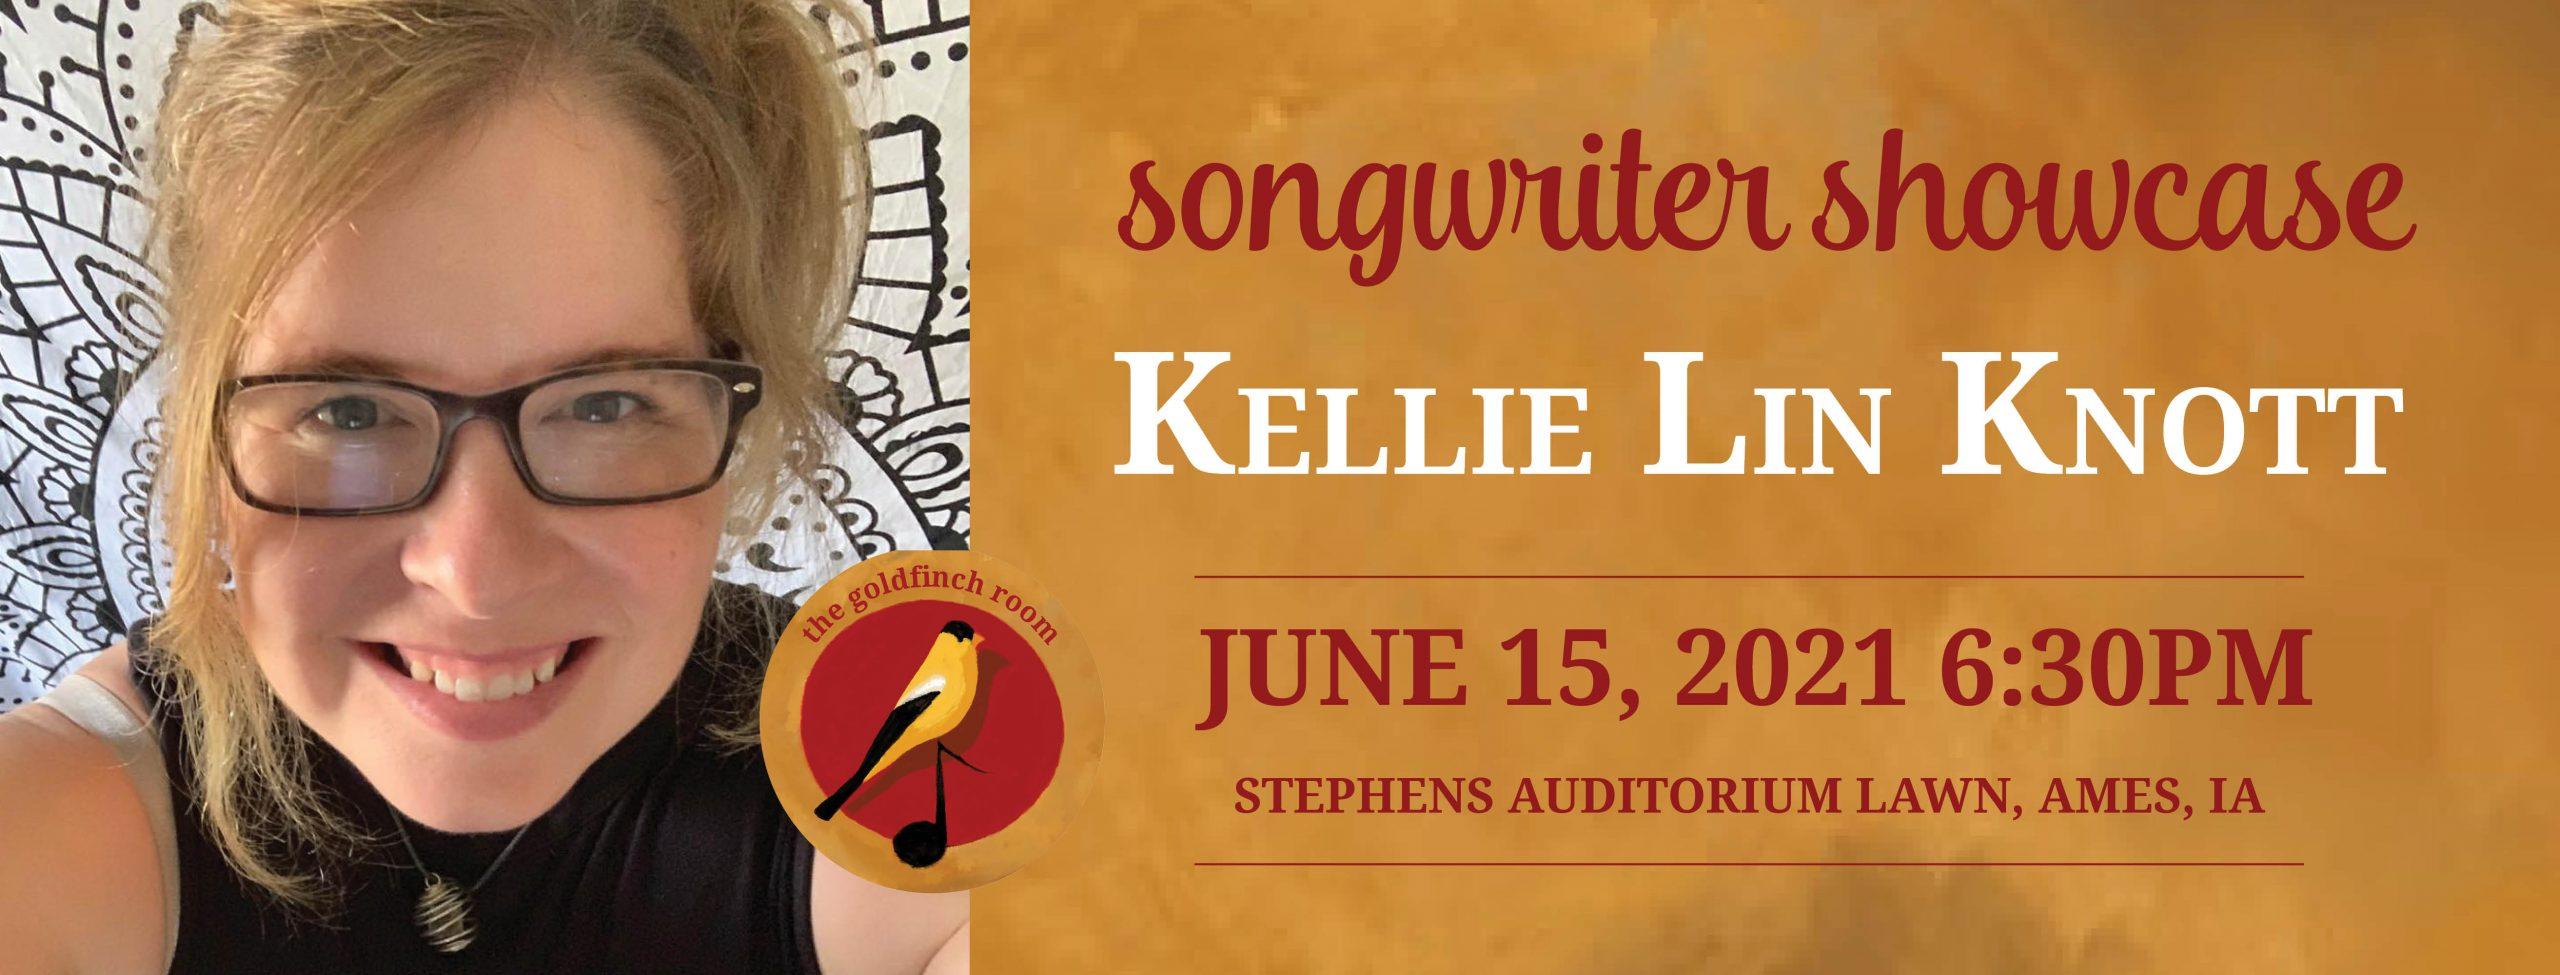 Kellie Lin Knott on June 15 at 6:30pm at Stephens Auditorium